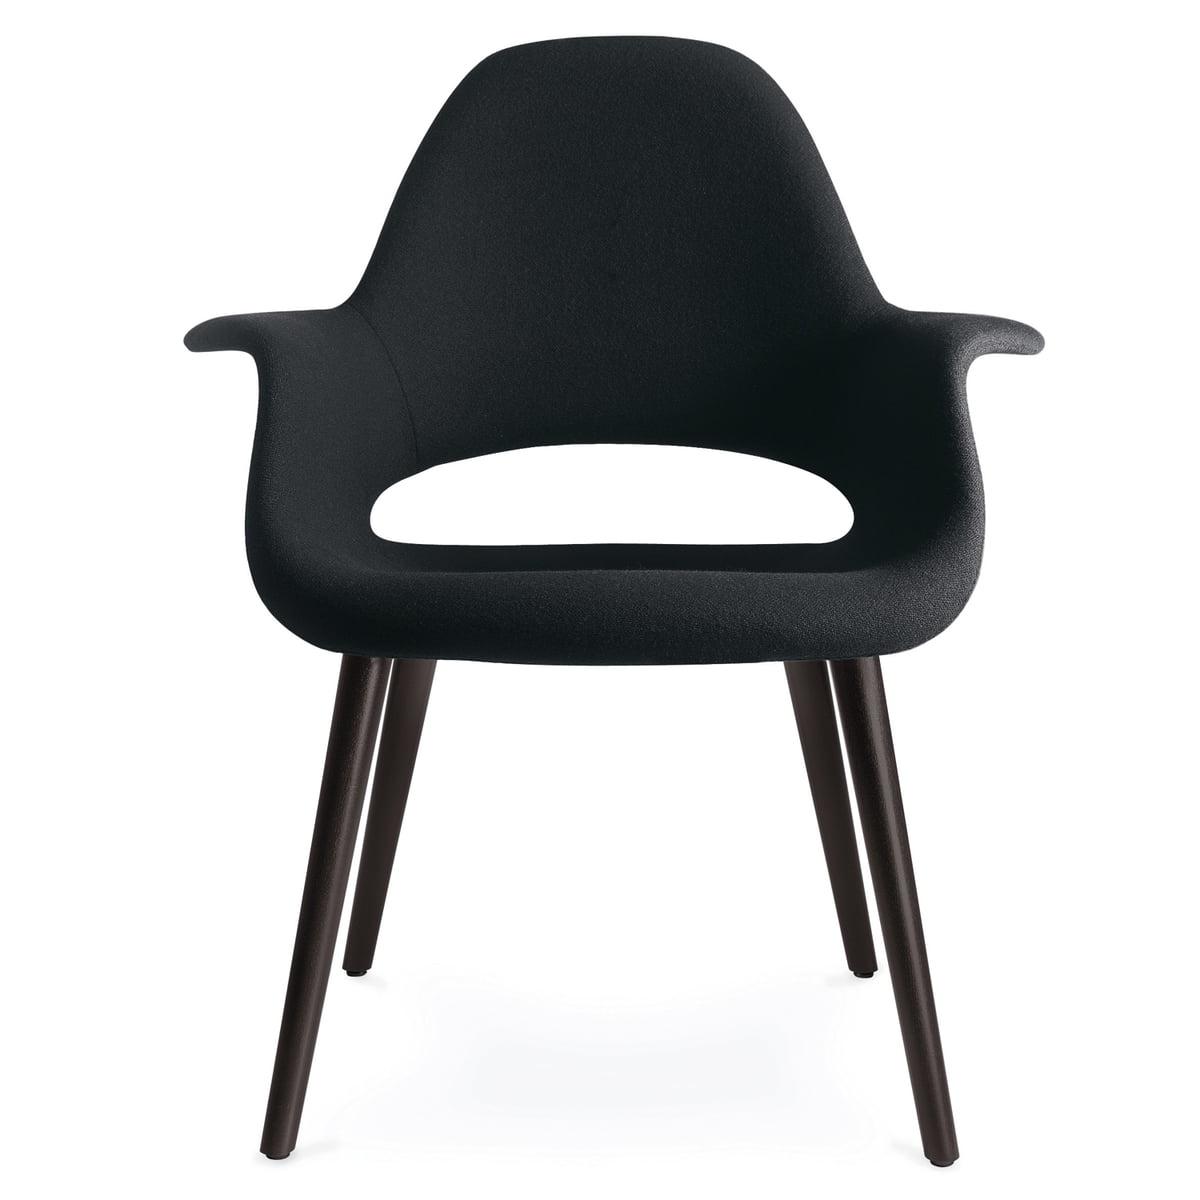 der organic stuhl von vitra im design shop. Black Bedroom Furniture Sets. Home Design Ideas